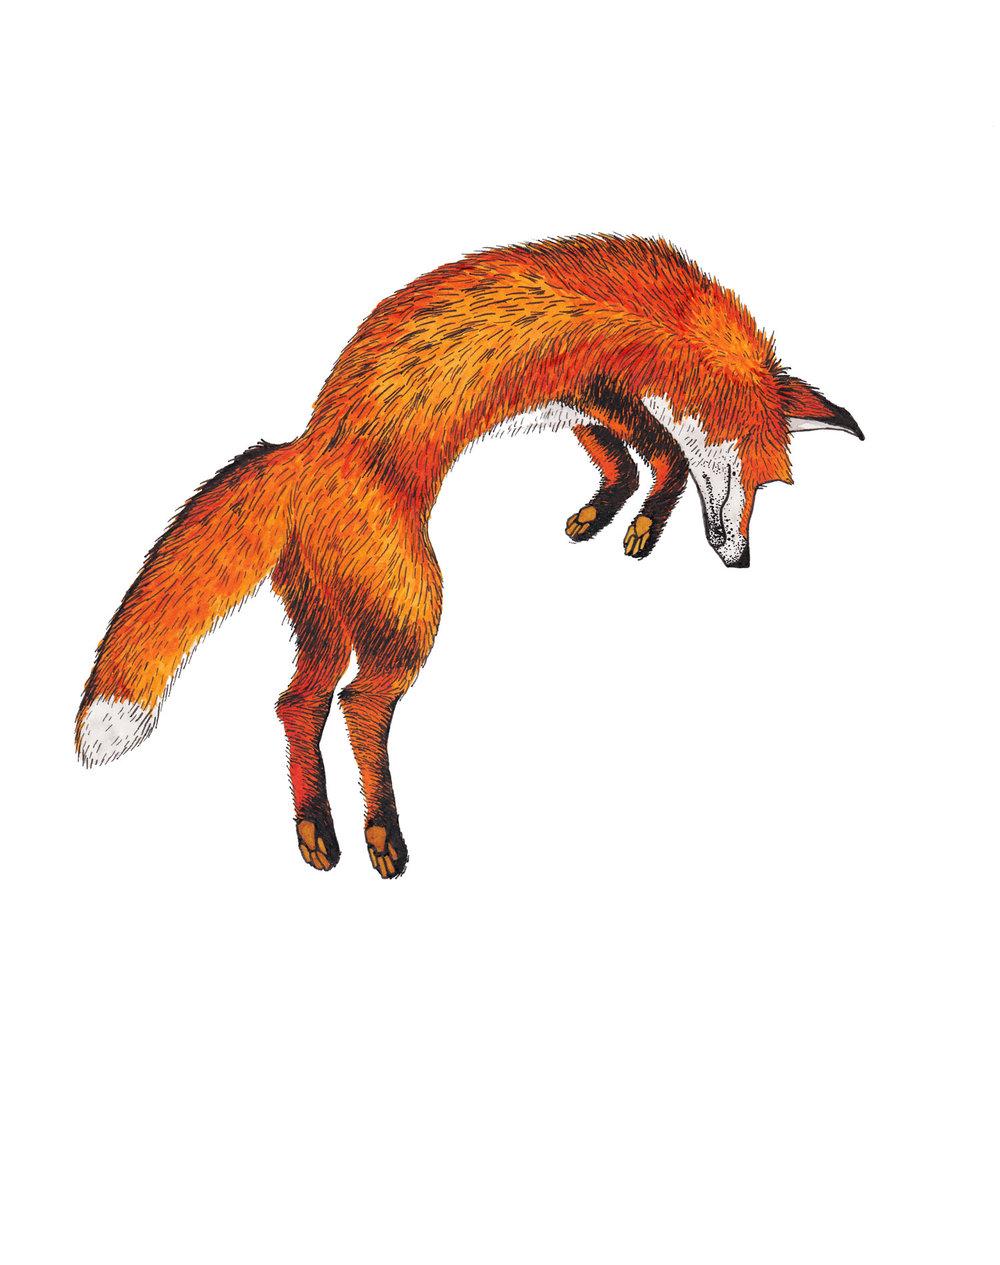 red-fox-leaping-illustration-matthew-woods.jpg